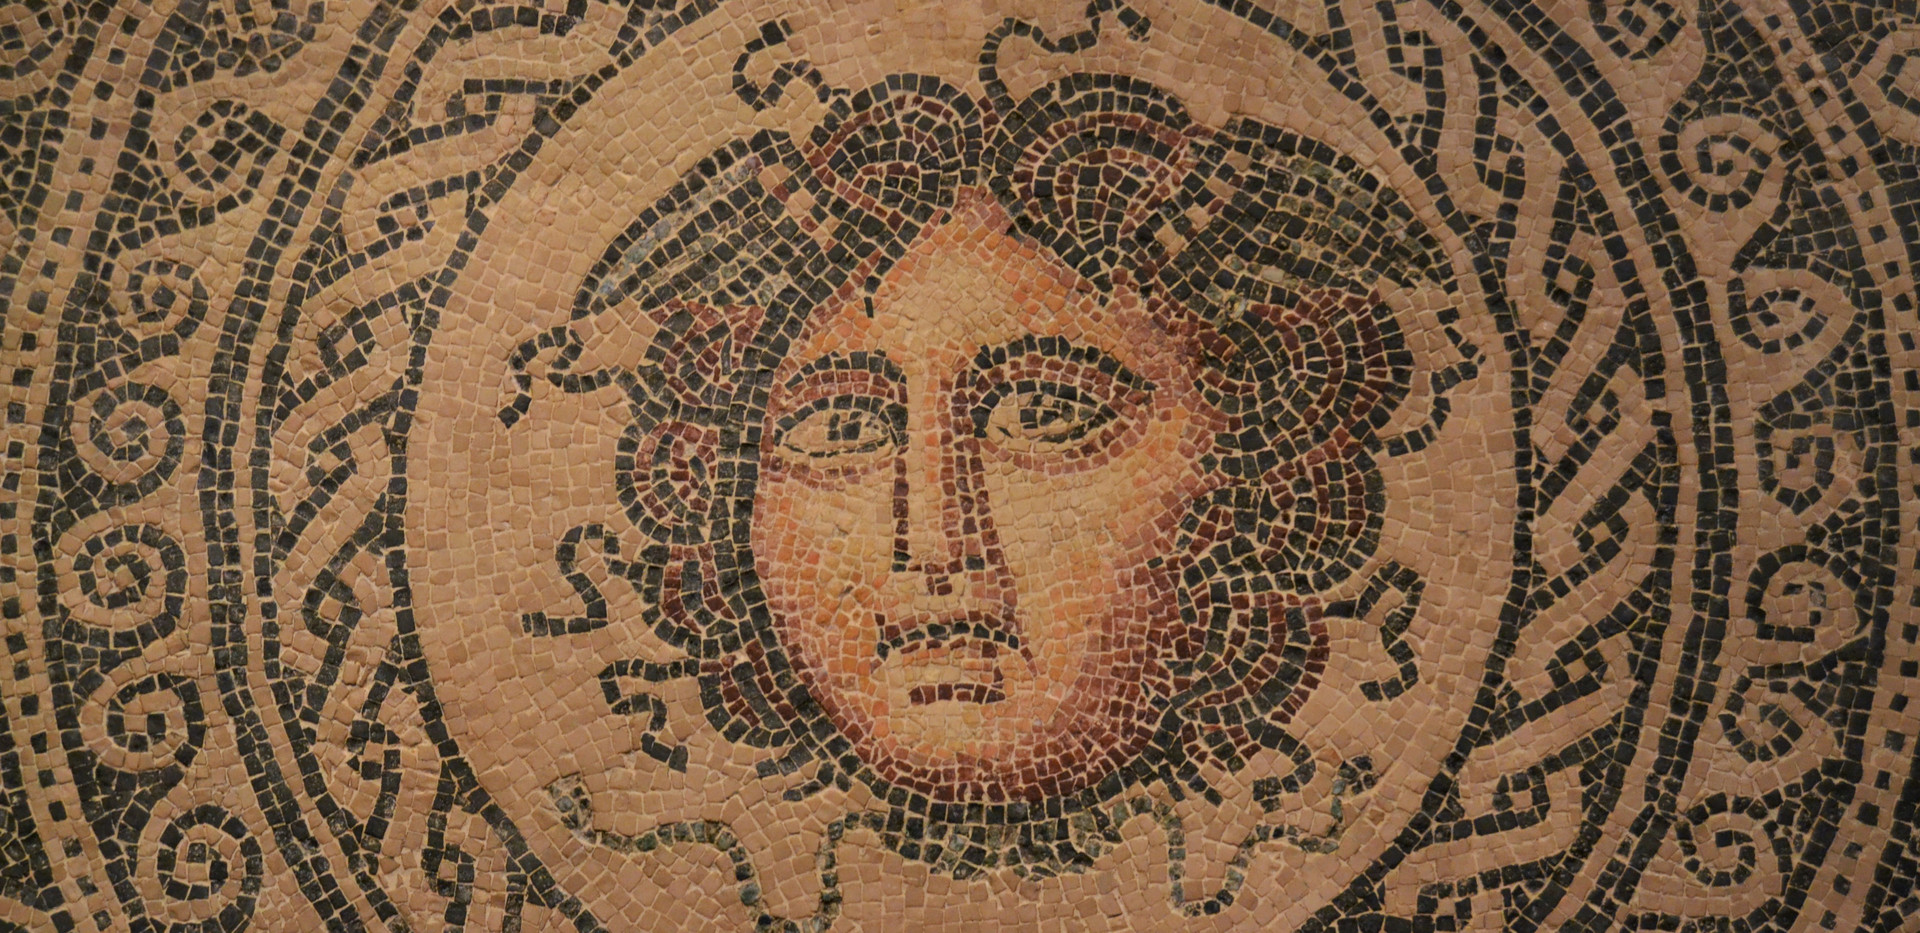 2nd century Roman mosaic found in Valencia